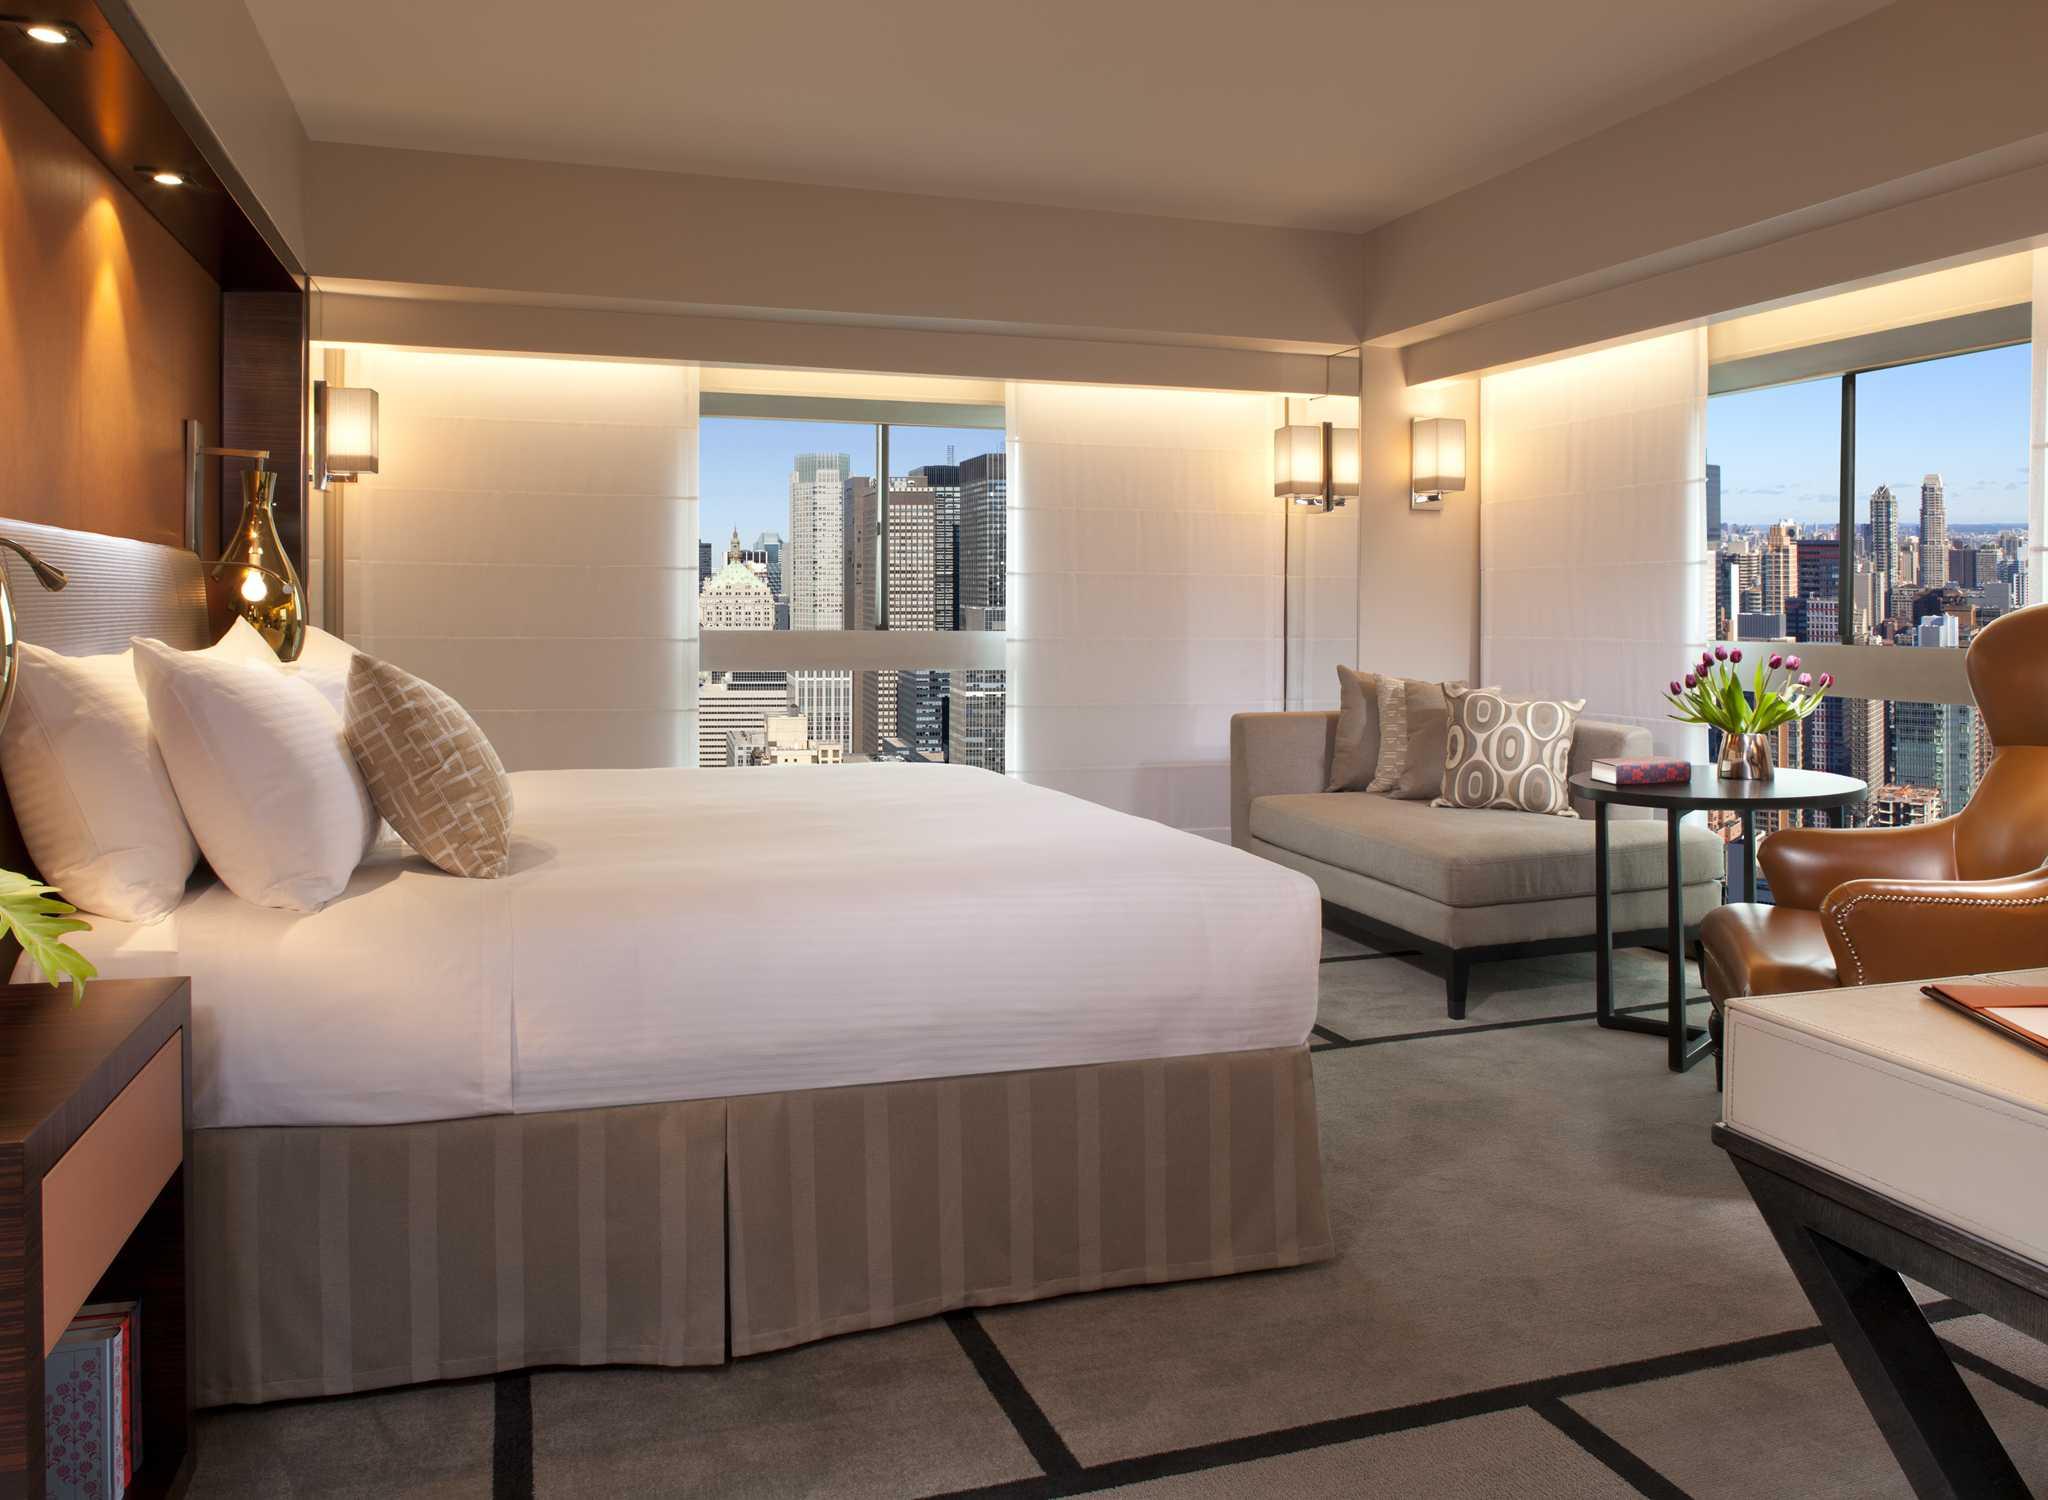 Millennium Hilton New York One Un Plaza Hotel Midtown East